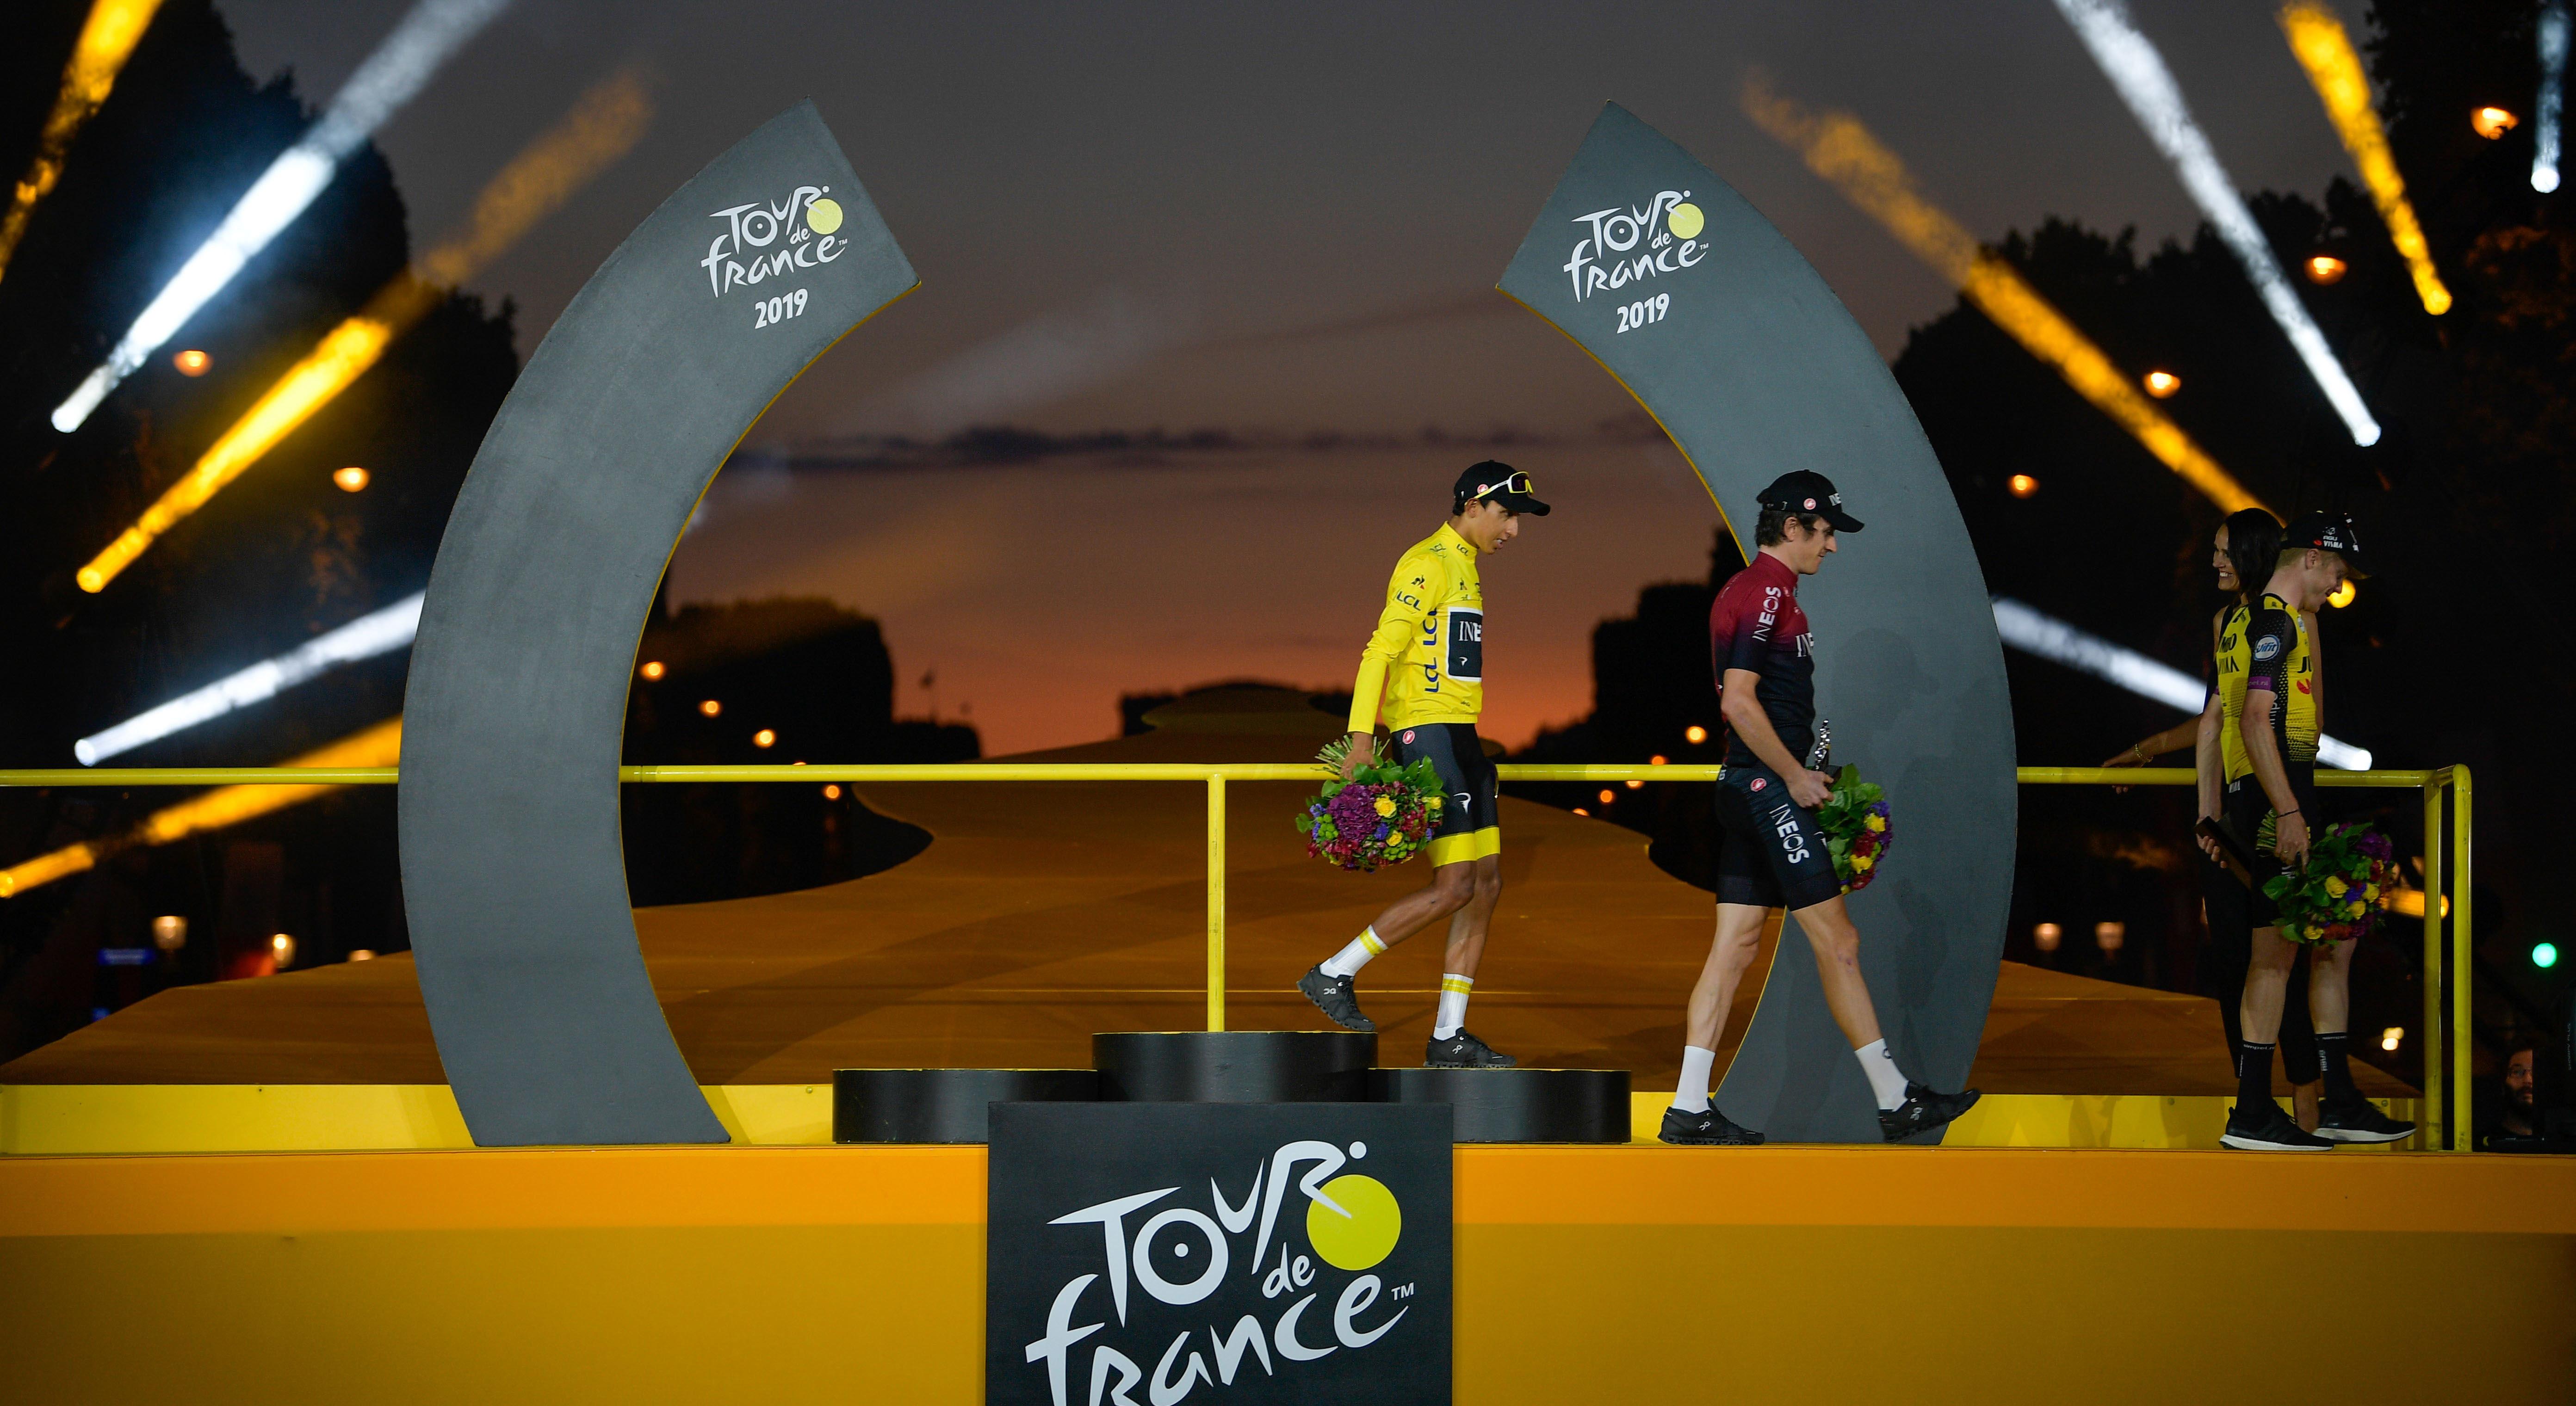 Egan Bernal - Tour de France 2019